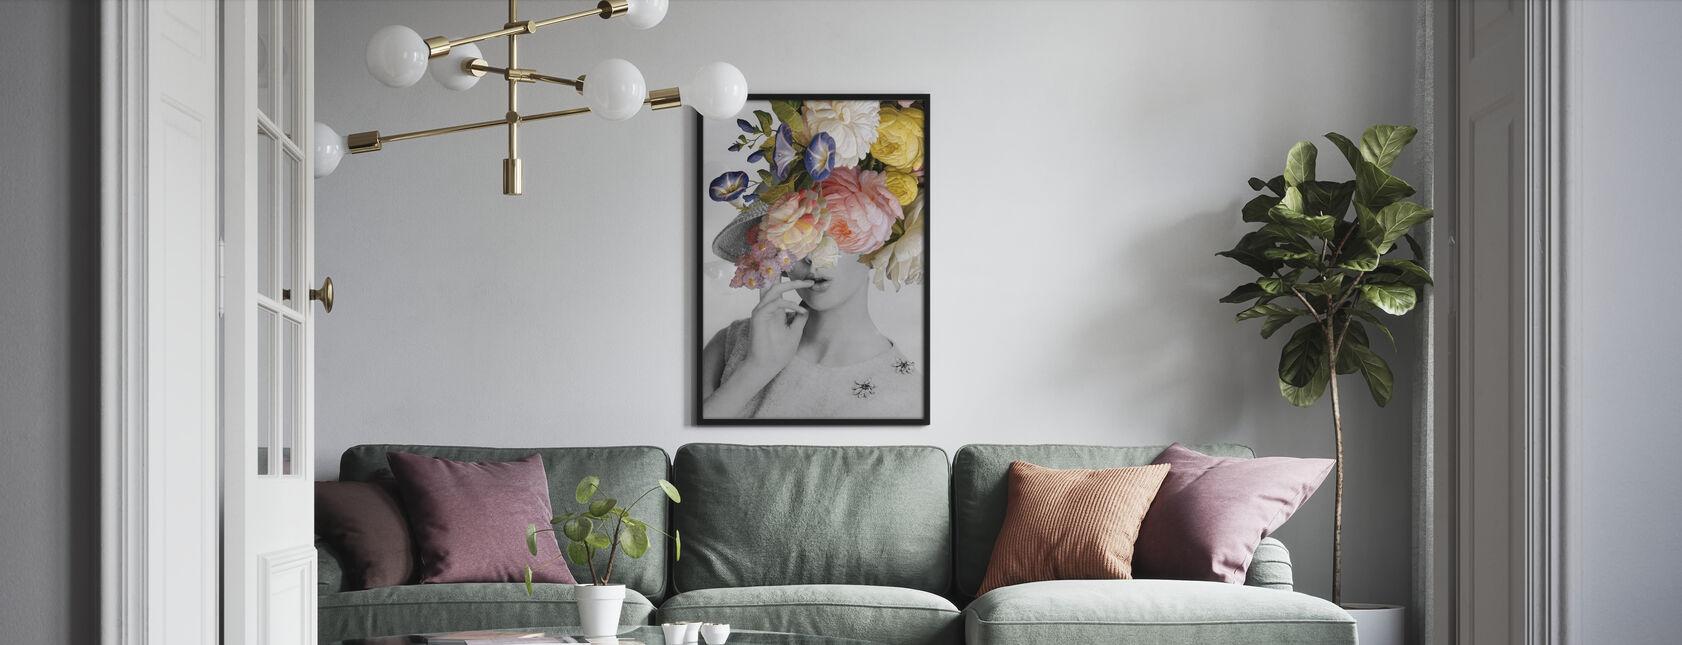 Garden Party I - Ingelijste print - Woonkamer